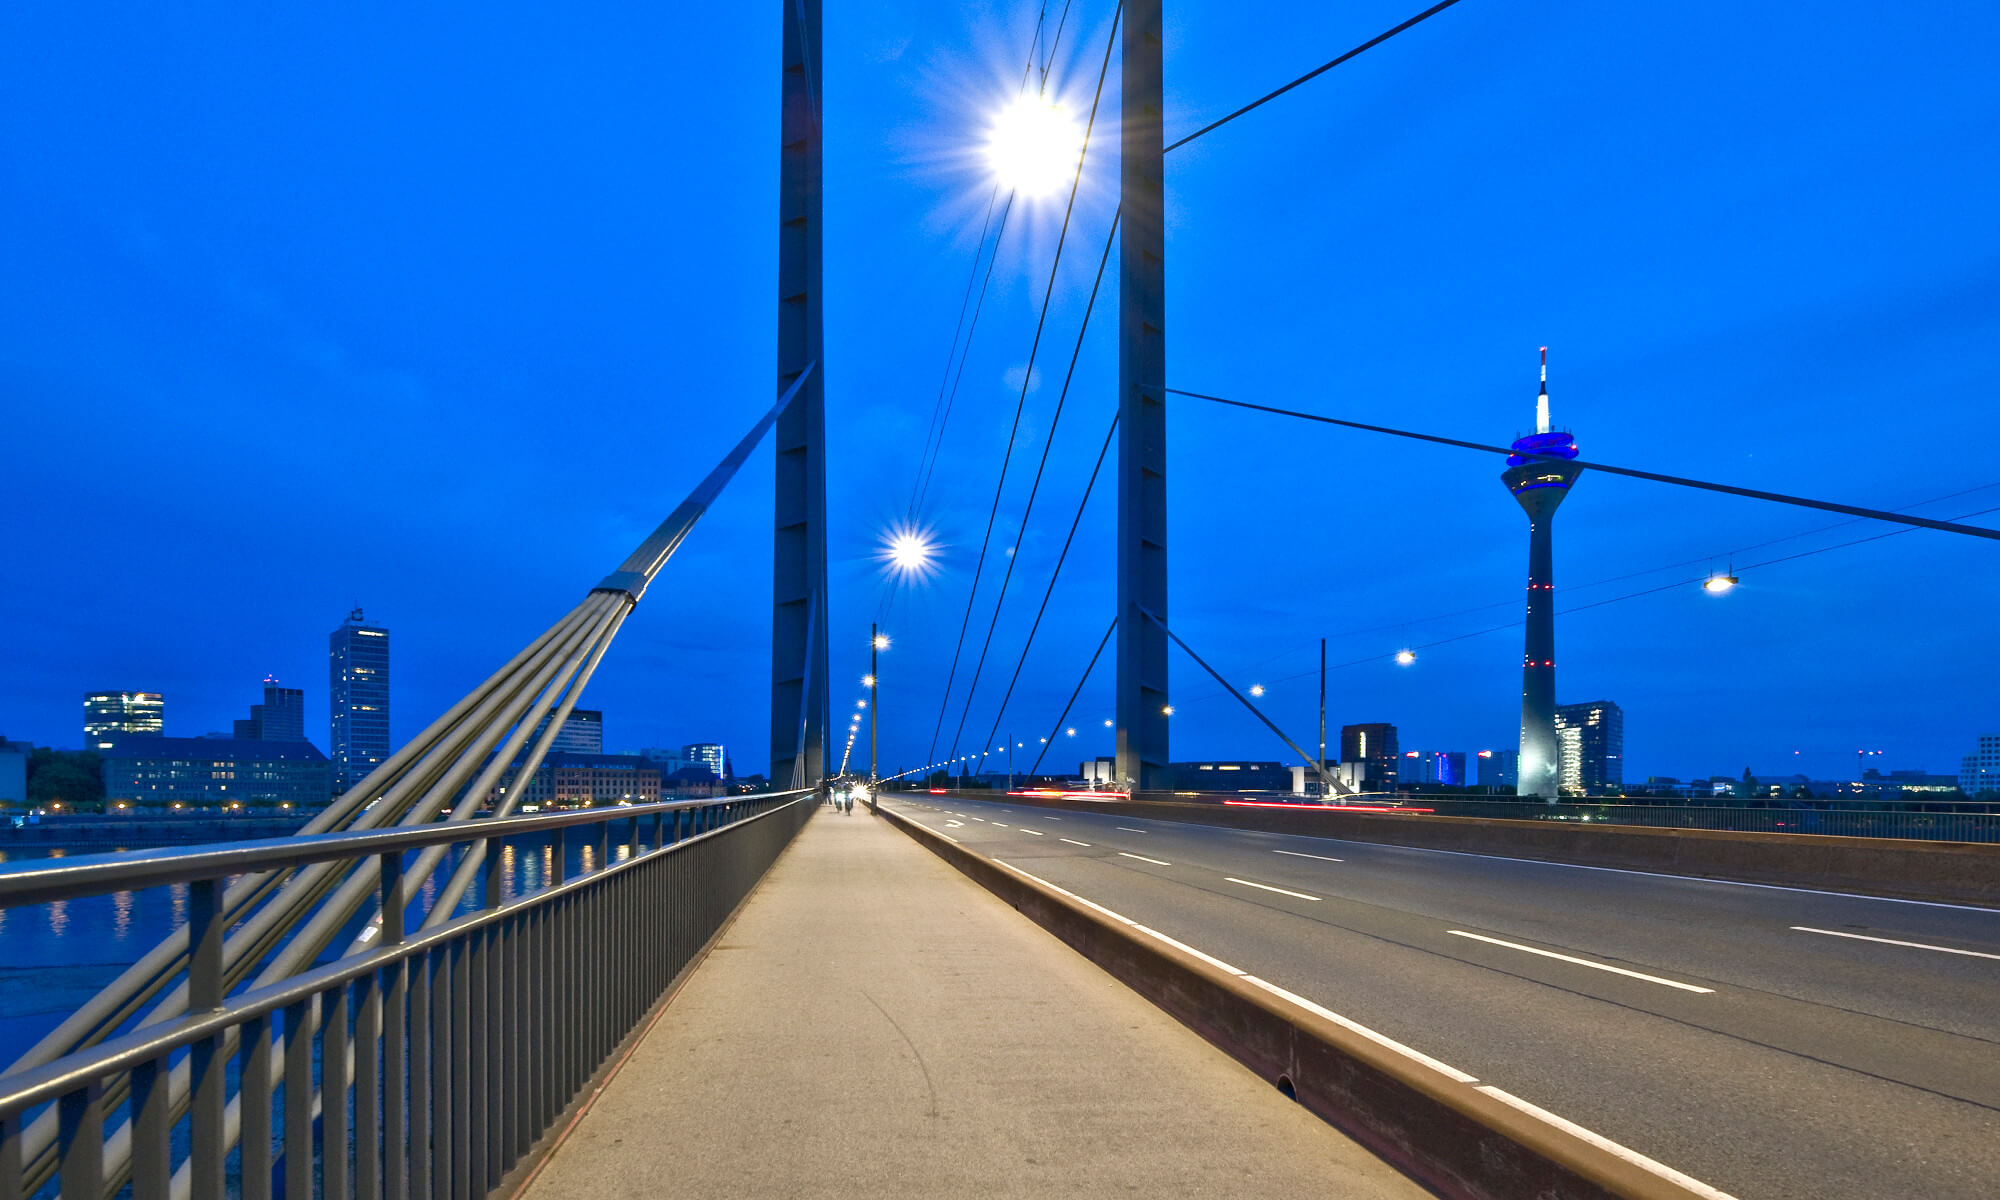 Beleuchtungslösung Referenz Straßenbeleuchtung Rheinbrücke Düsseldorf